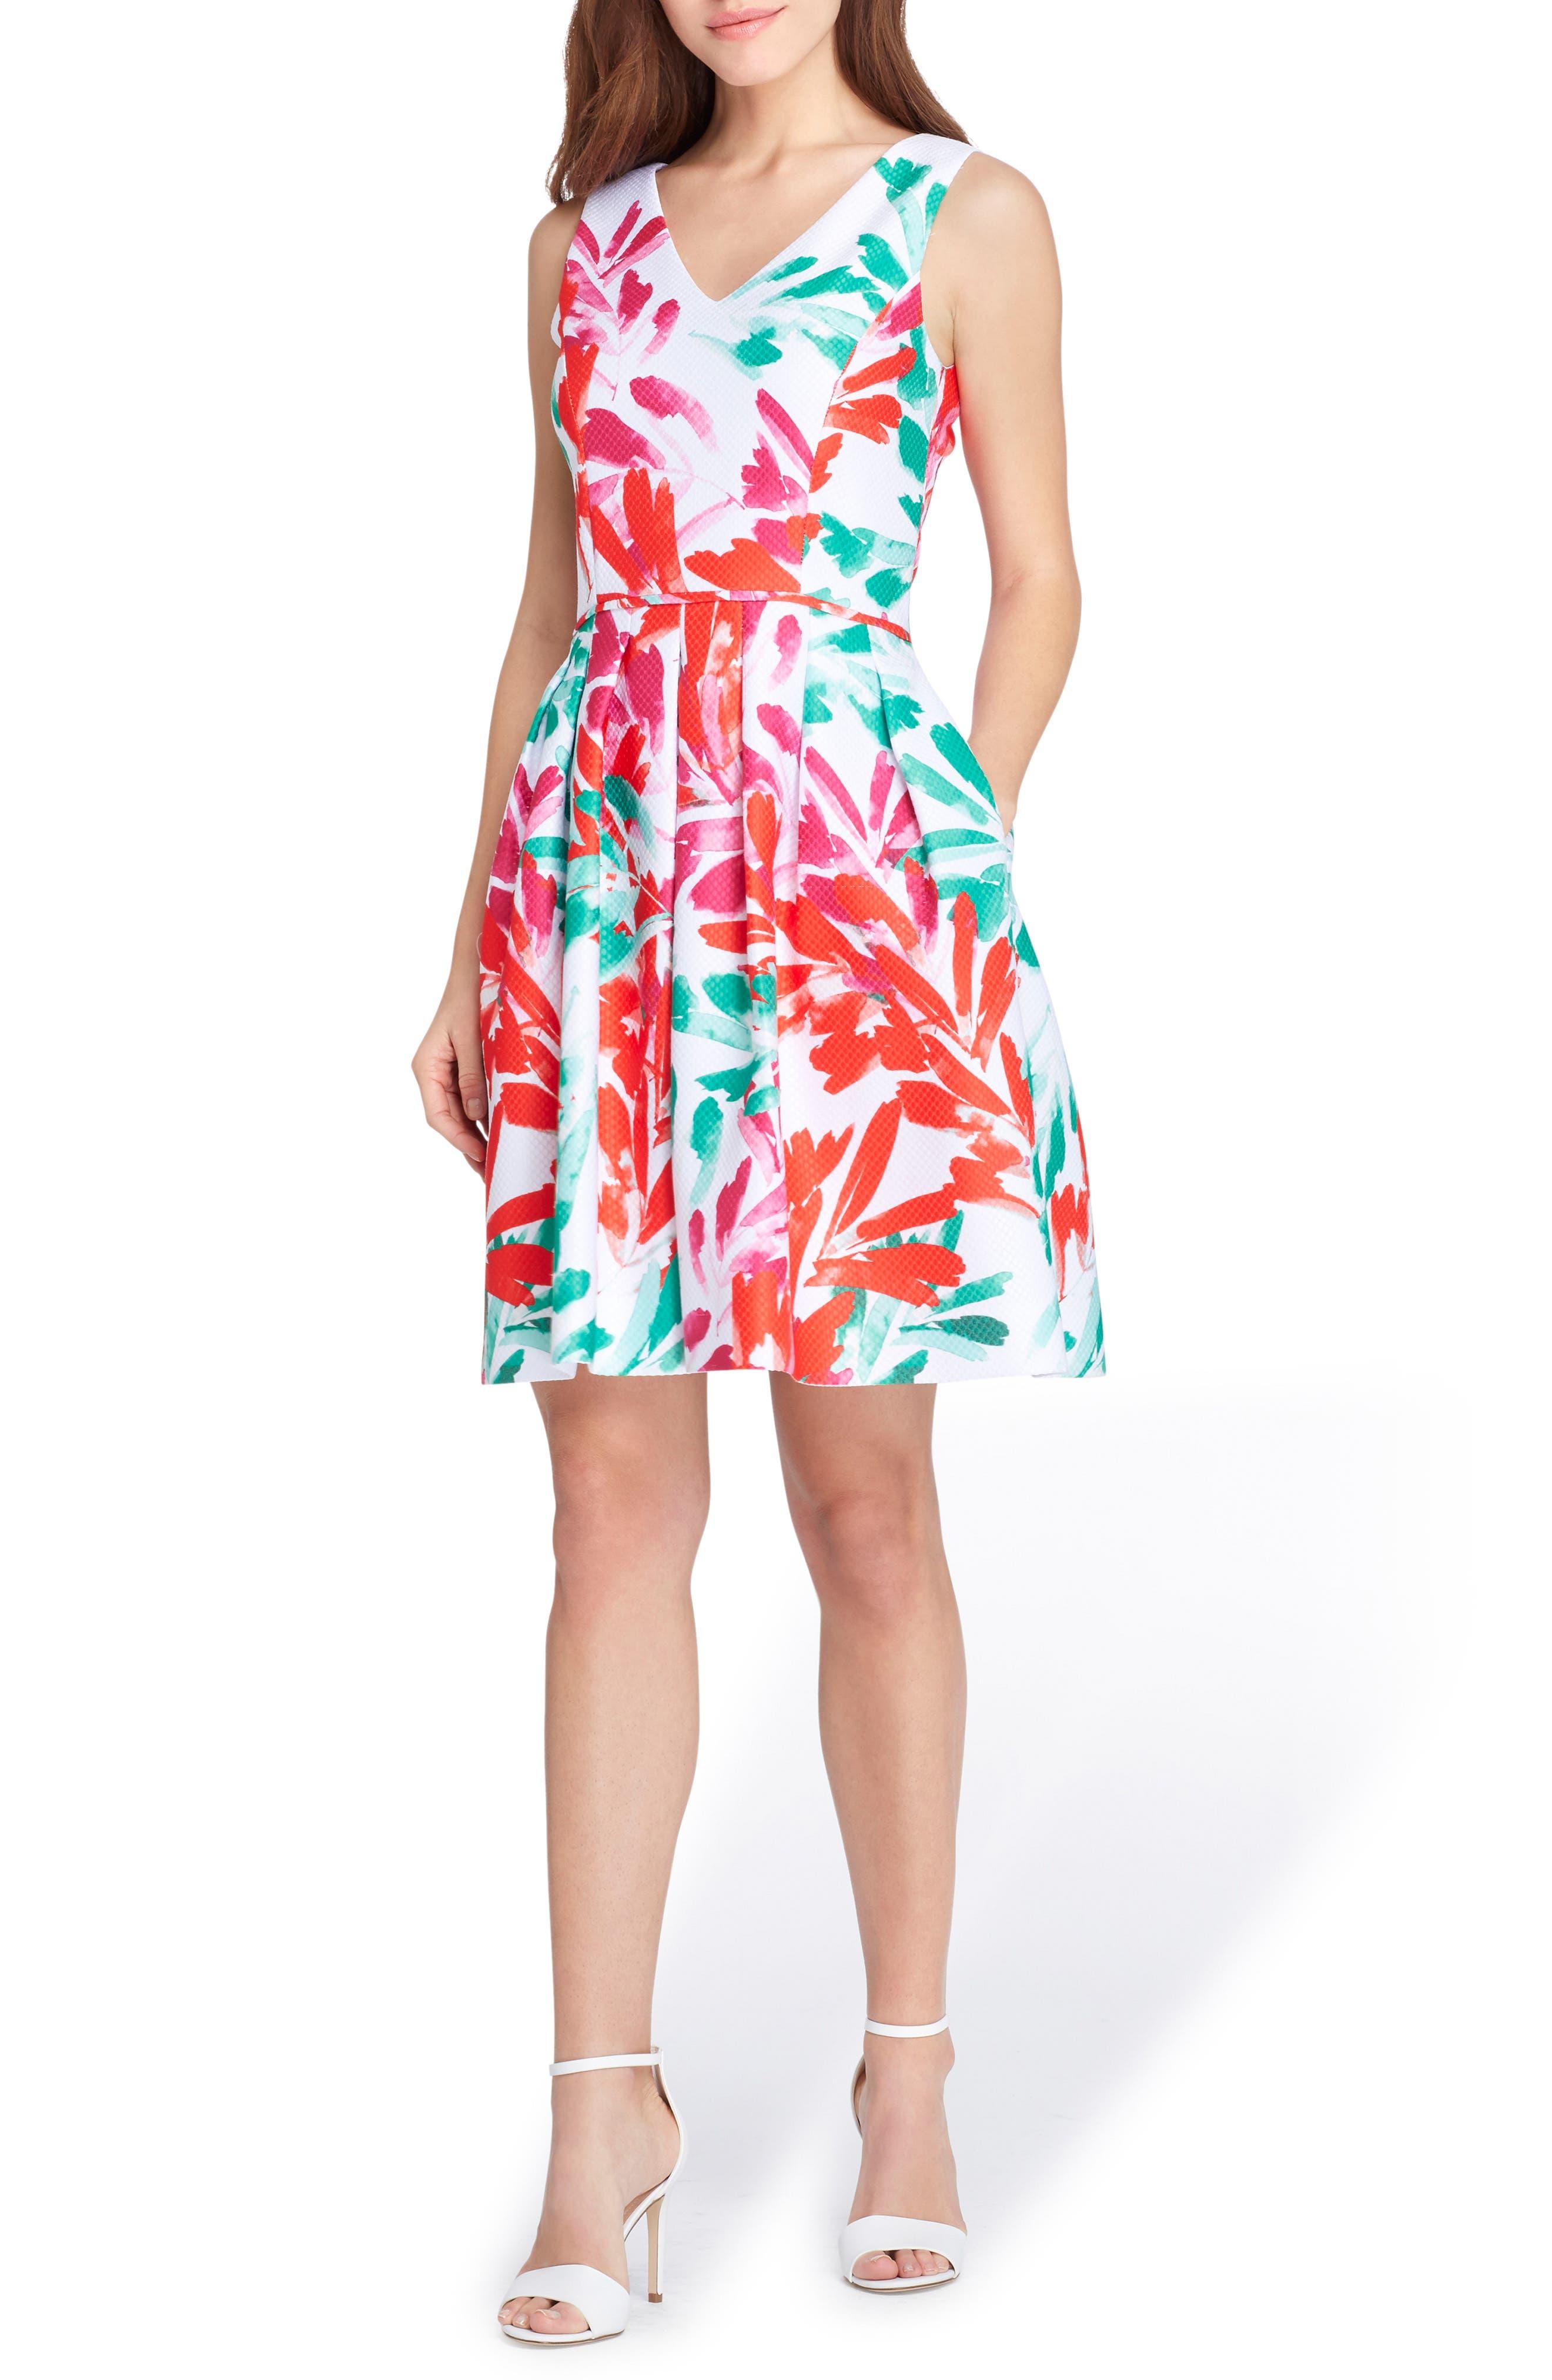 Print Jacquard Dress,                             Main thumbnail 1, color,                             White/ Coral/ Sea Glass